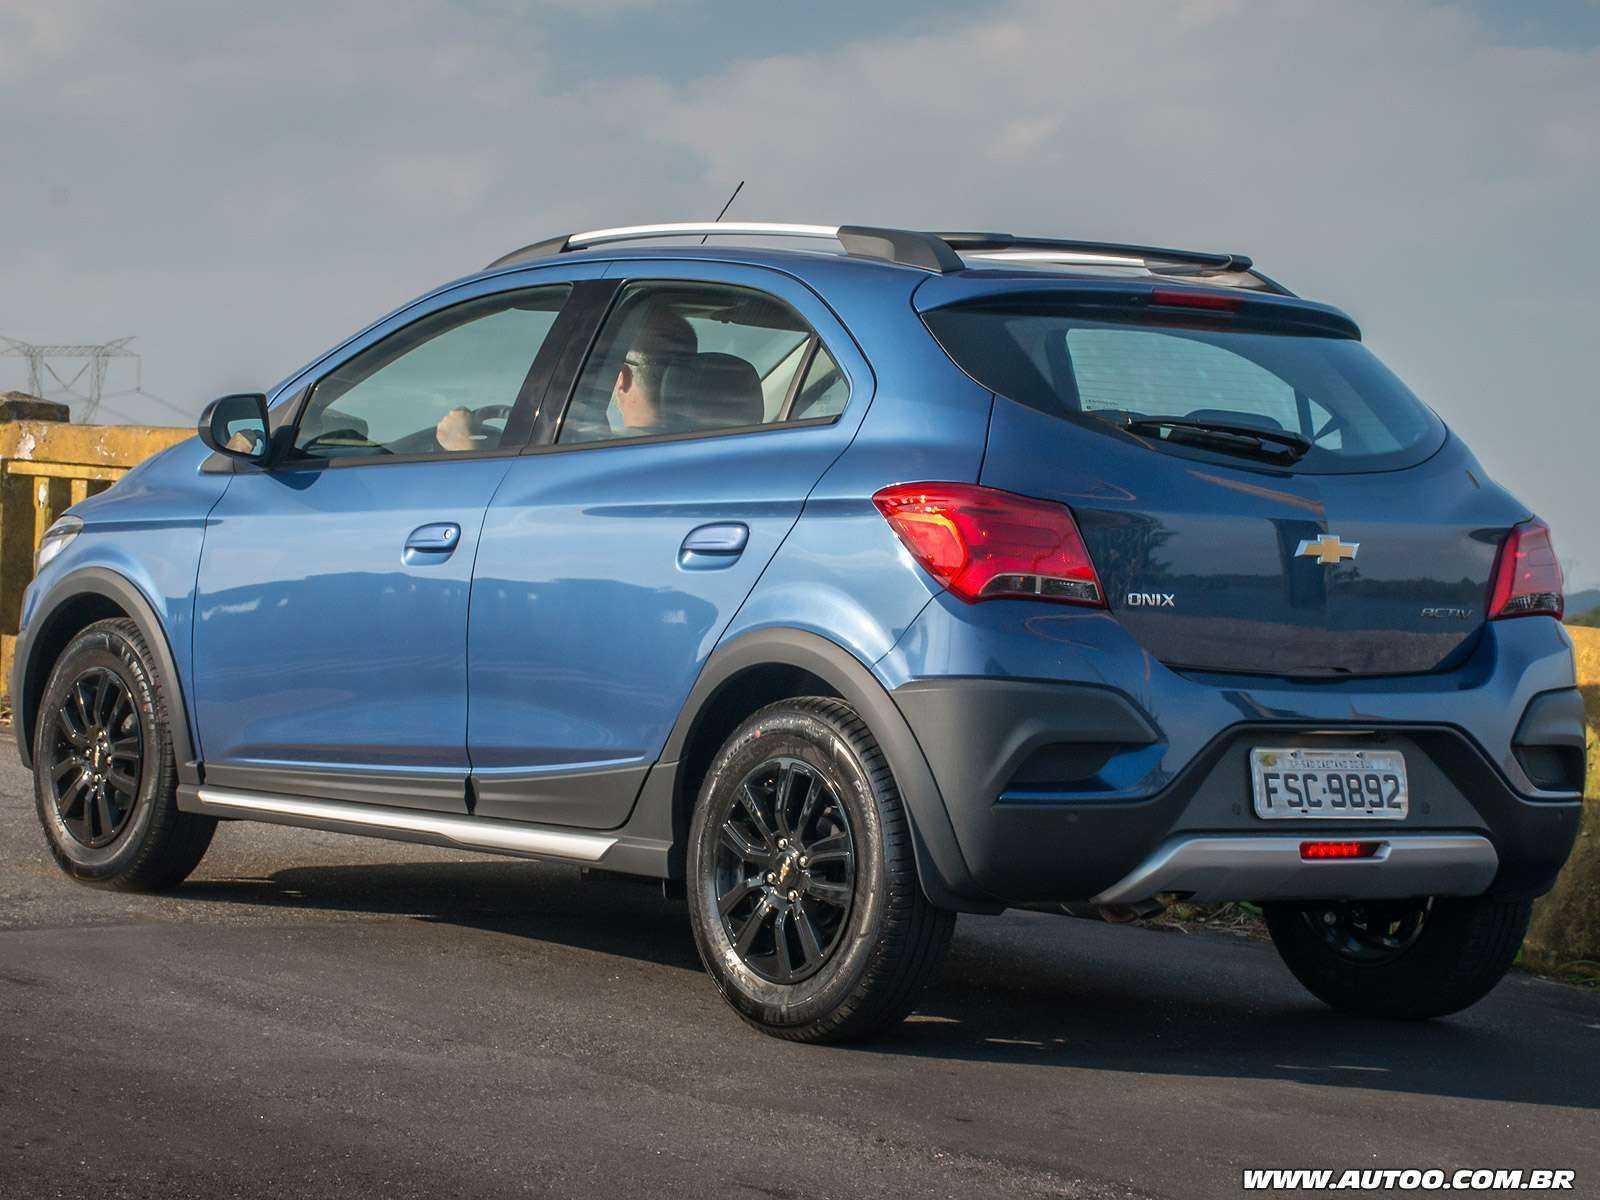 ChevroletOnix 2019 - ângulo traseiro